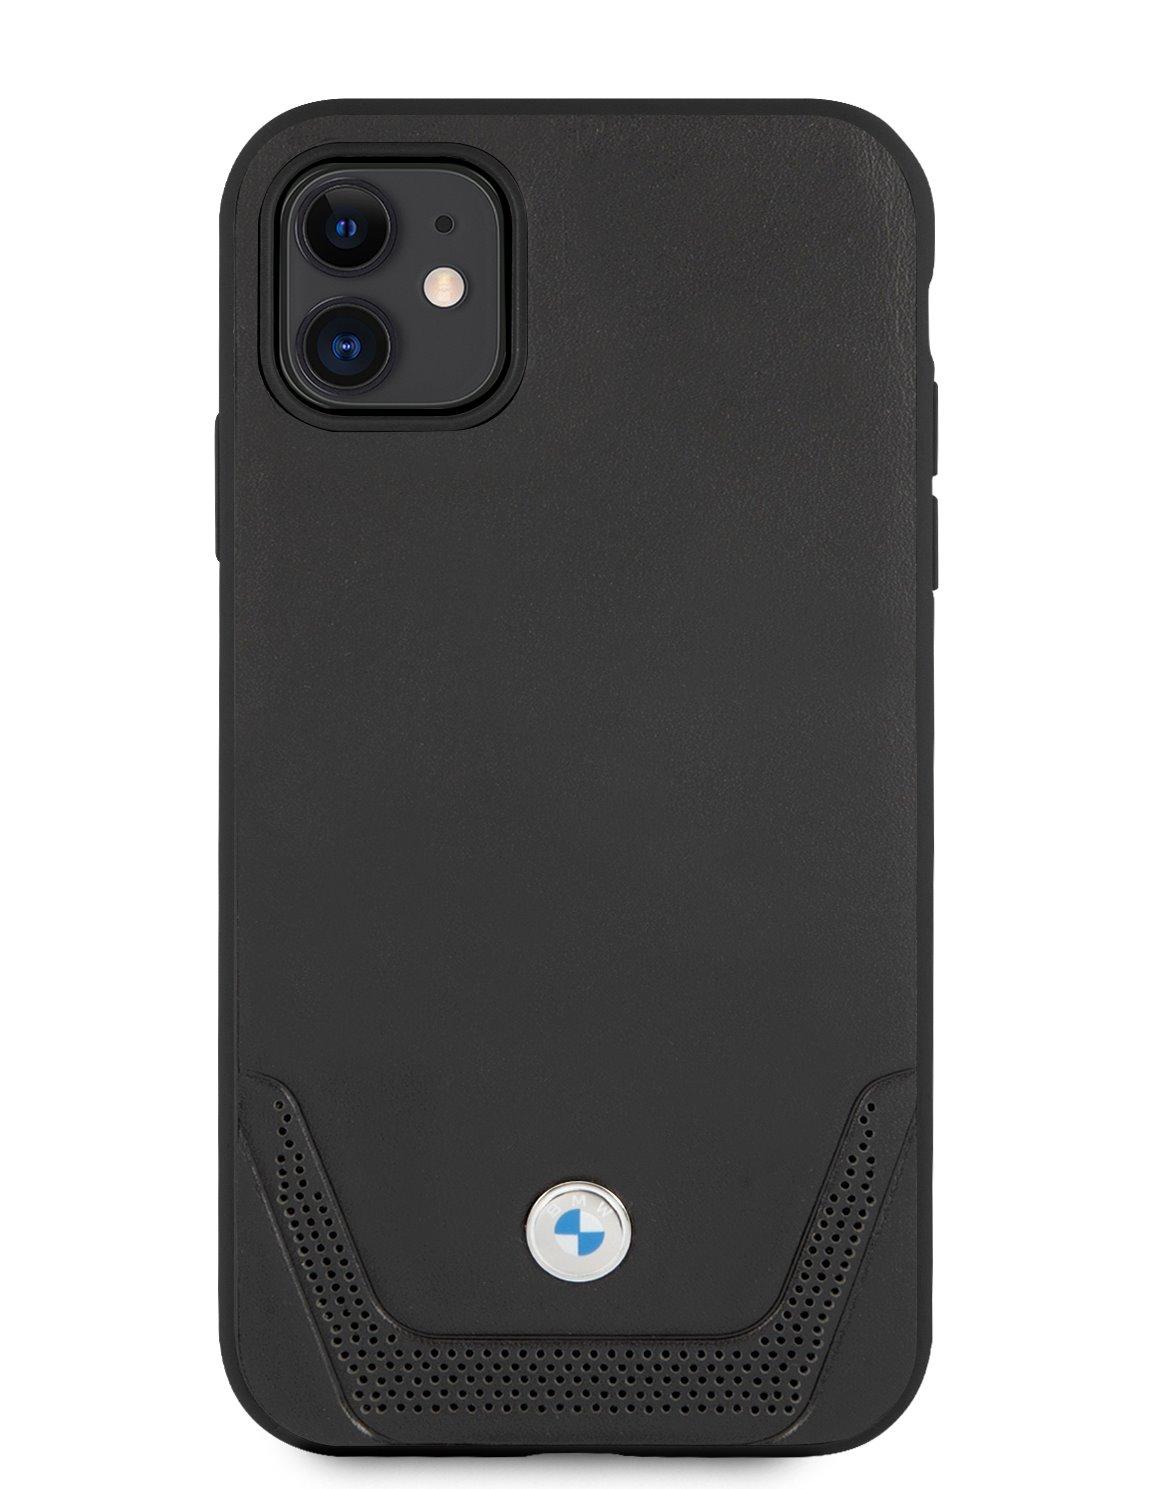 Ochranný kryt BMW Signature Leather Lower Stripe BMHCP12LRSWPK pro Apple iPhone 12 Pro Max, černá